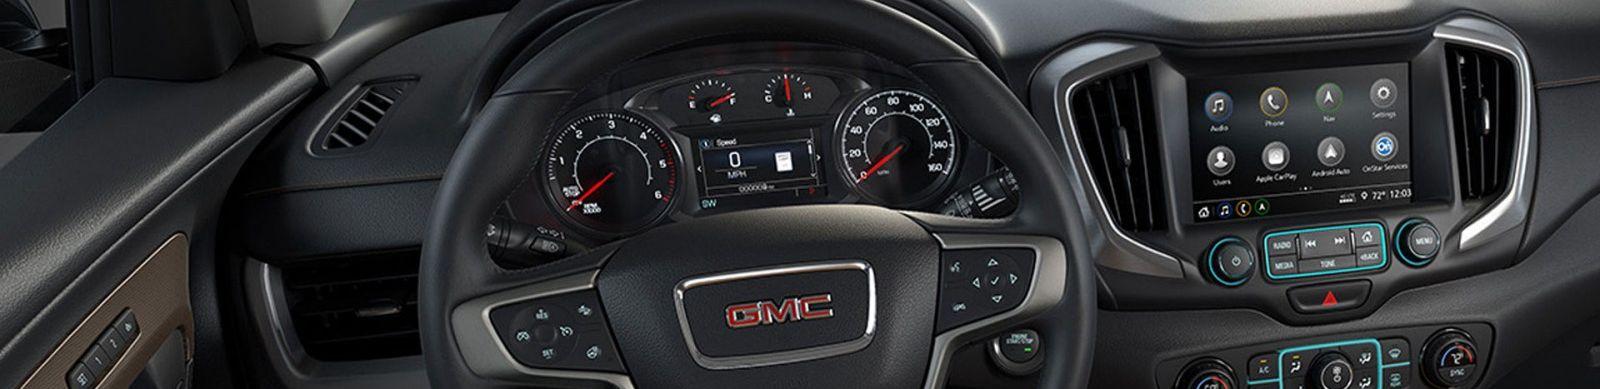 2018 GMC Terrain Center Console